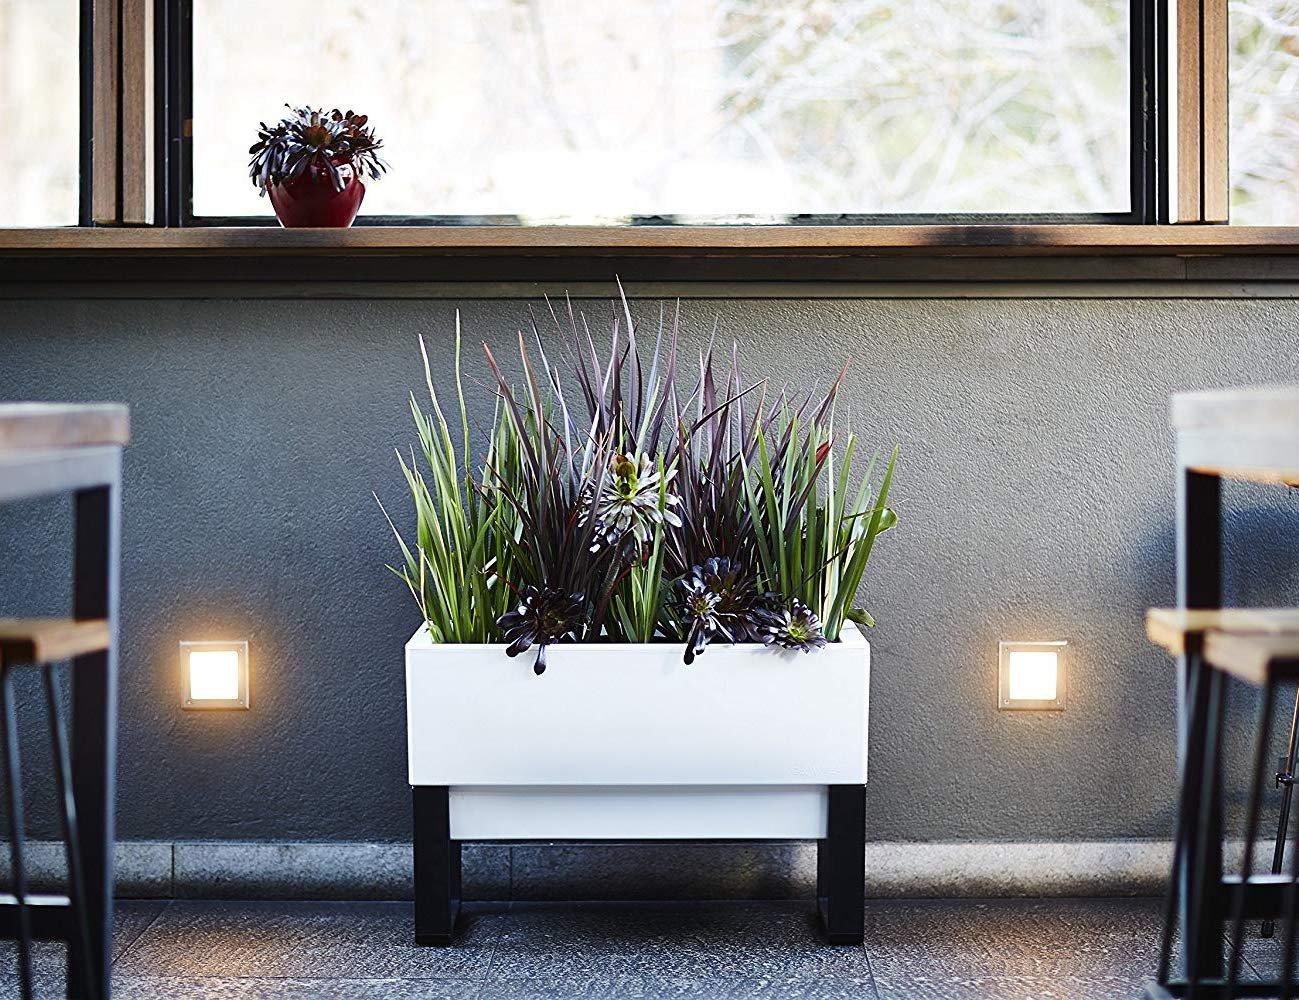 Glowpear Urban Garden Self-Watering Planter Box is an eco-friendly time saver